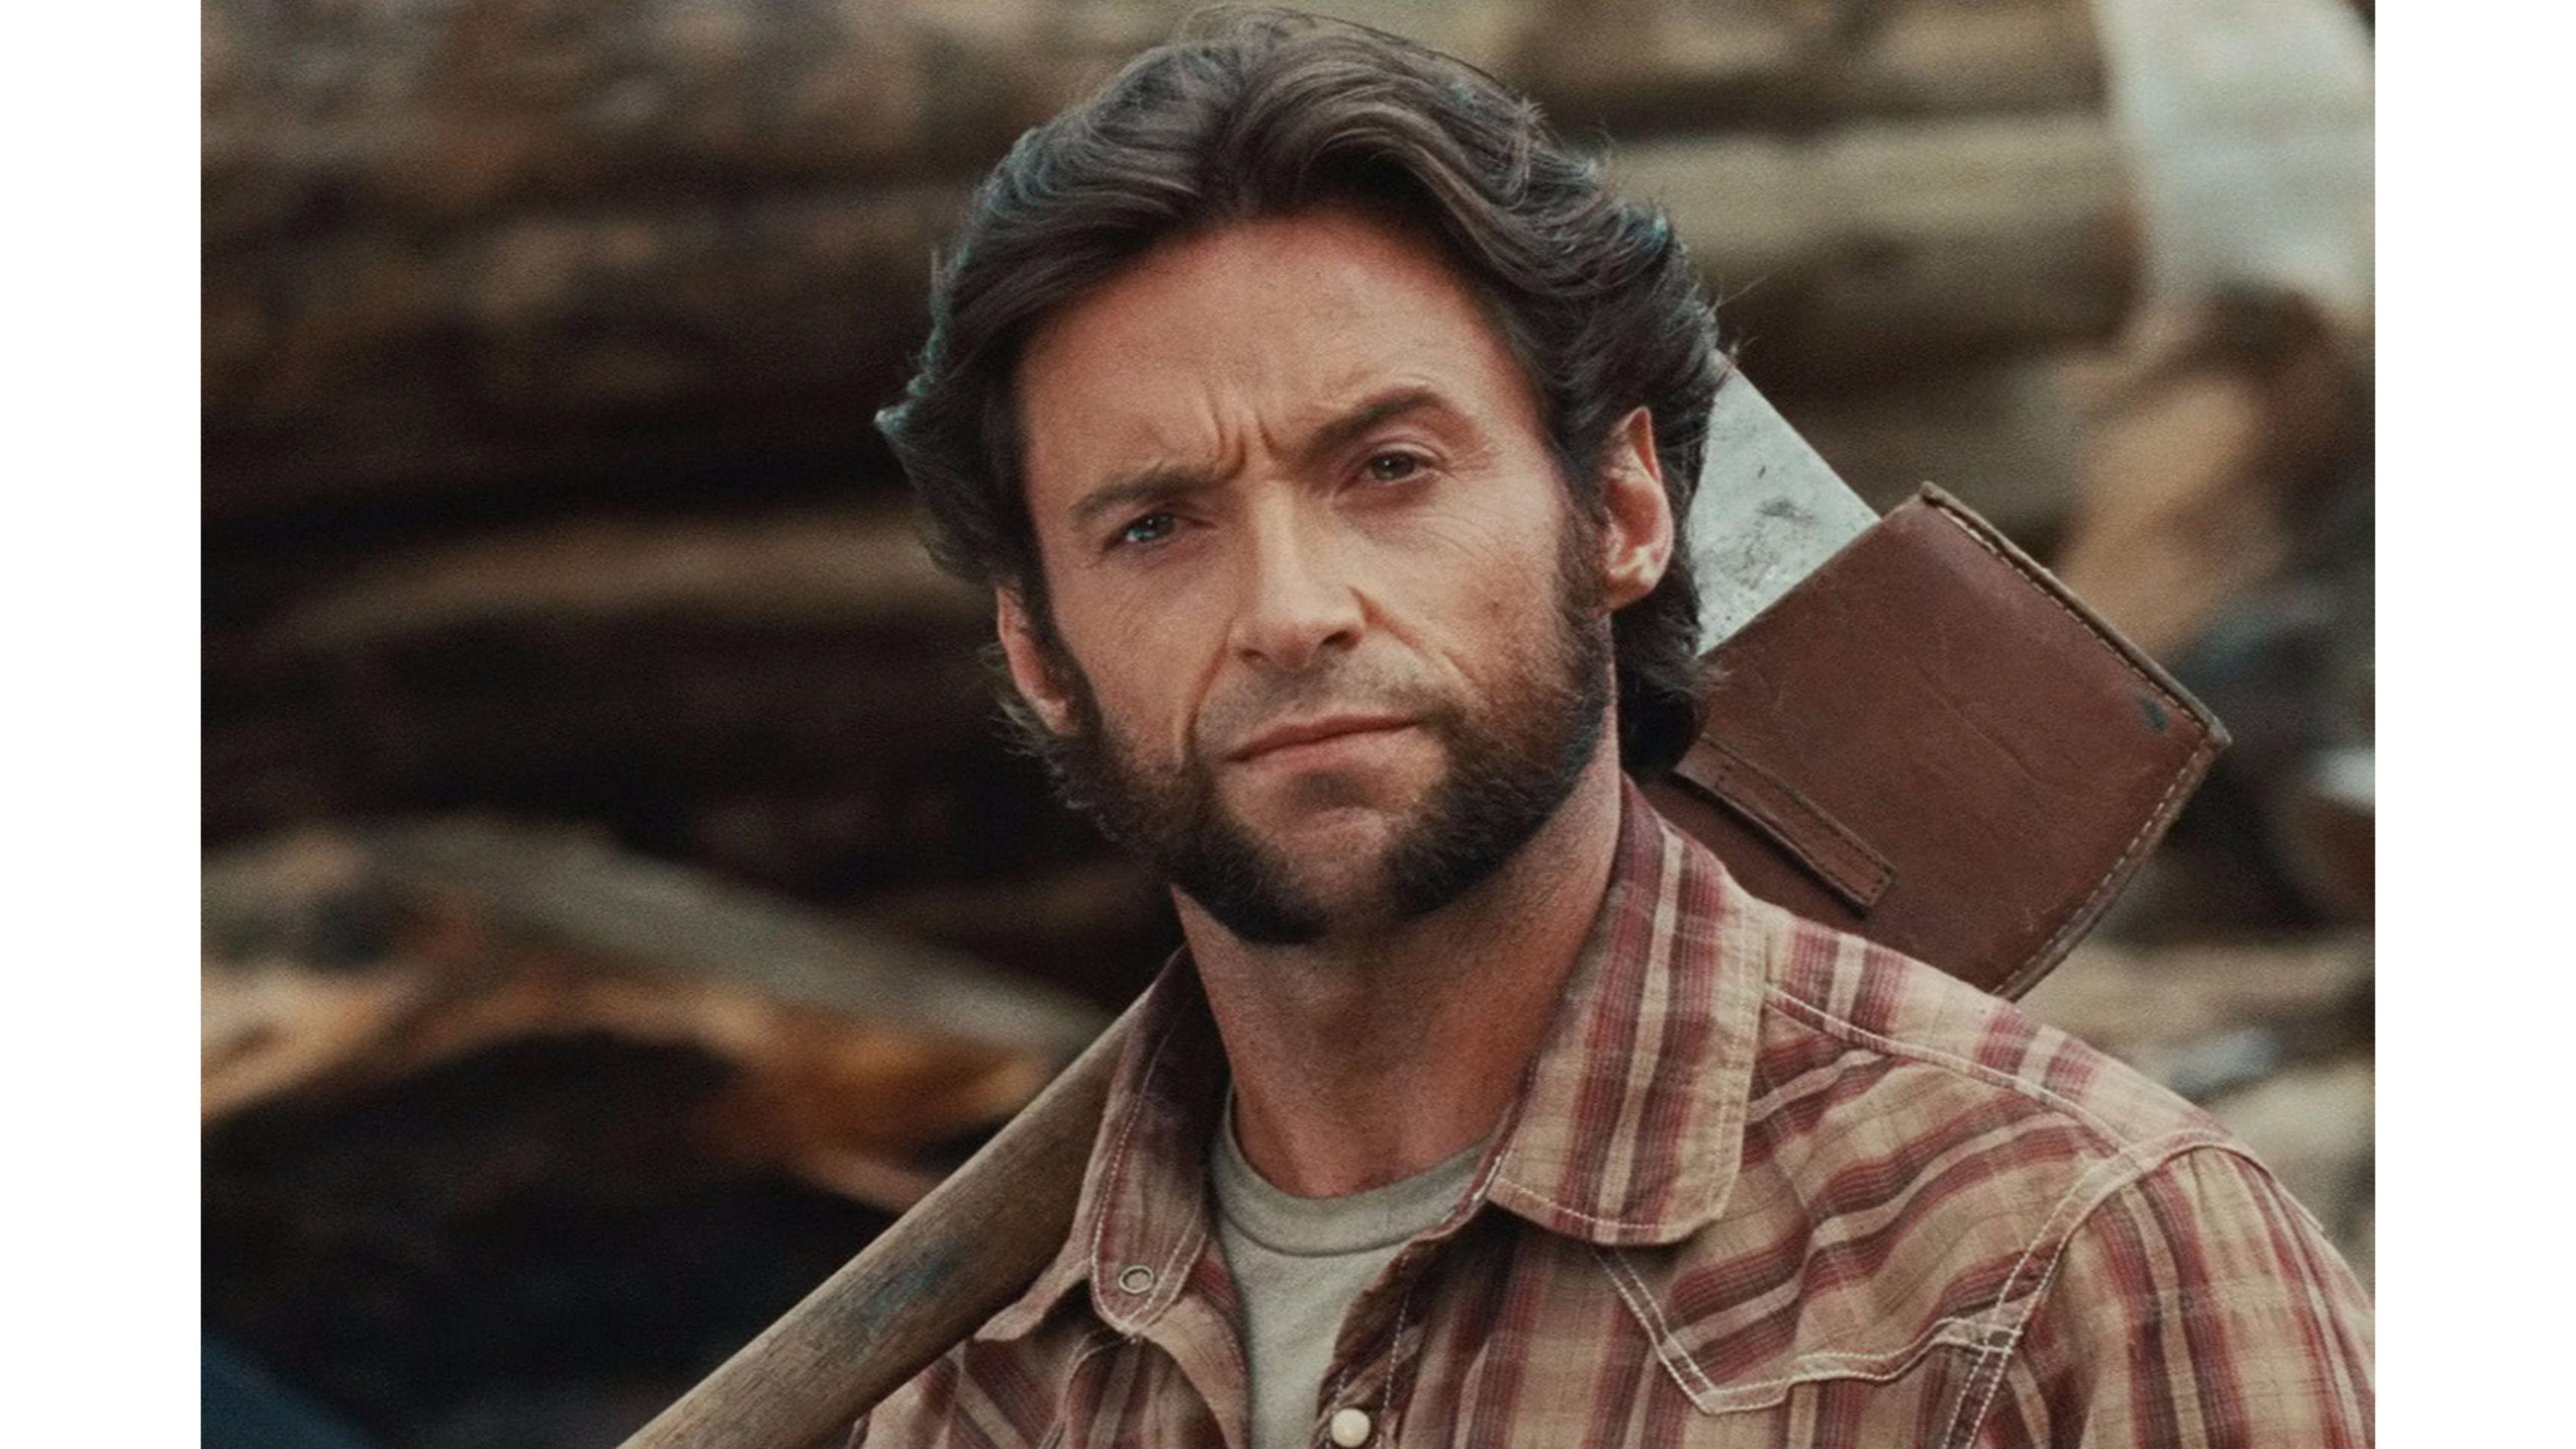 Hugh Jackman Wallpapers Hd: Wolverine Hugh Jackman Wallpapers 2017